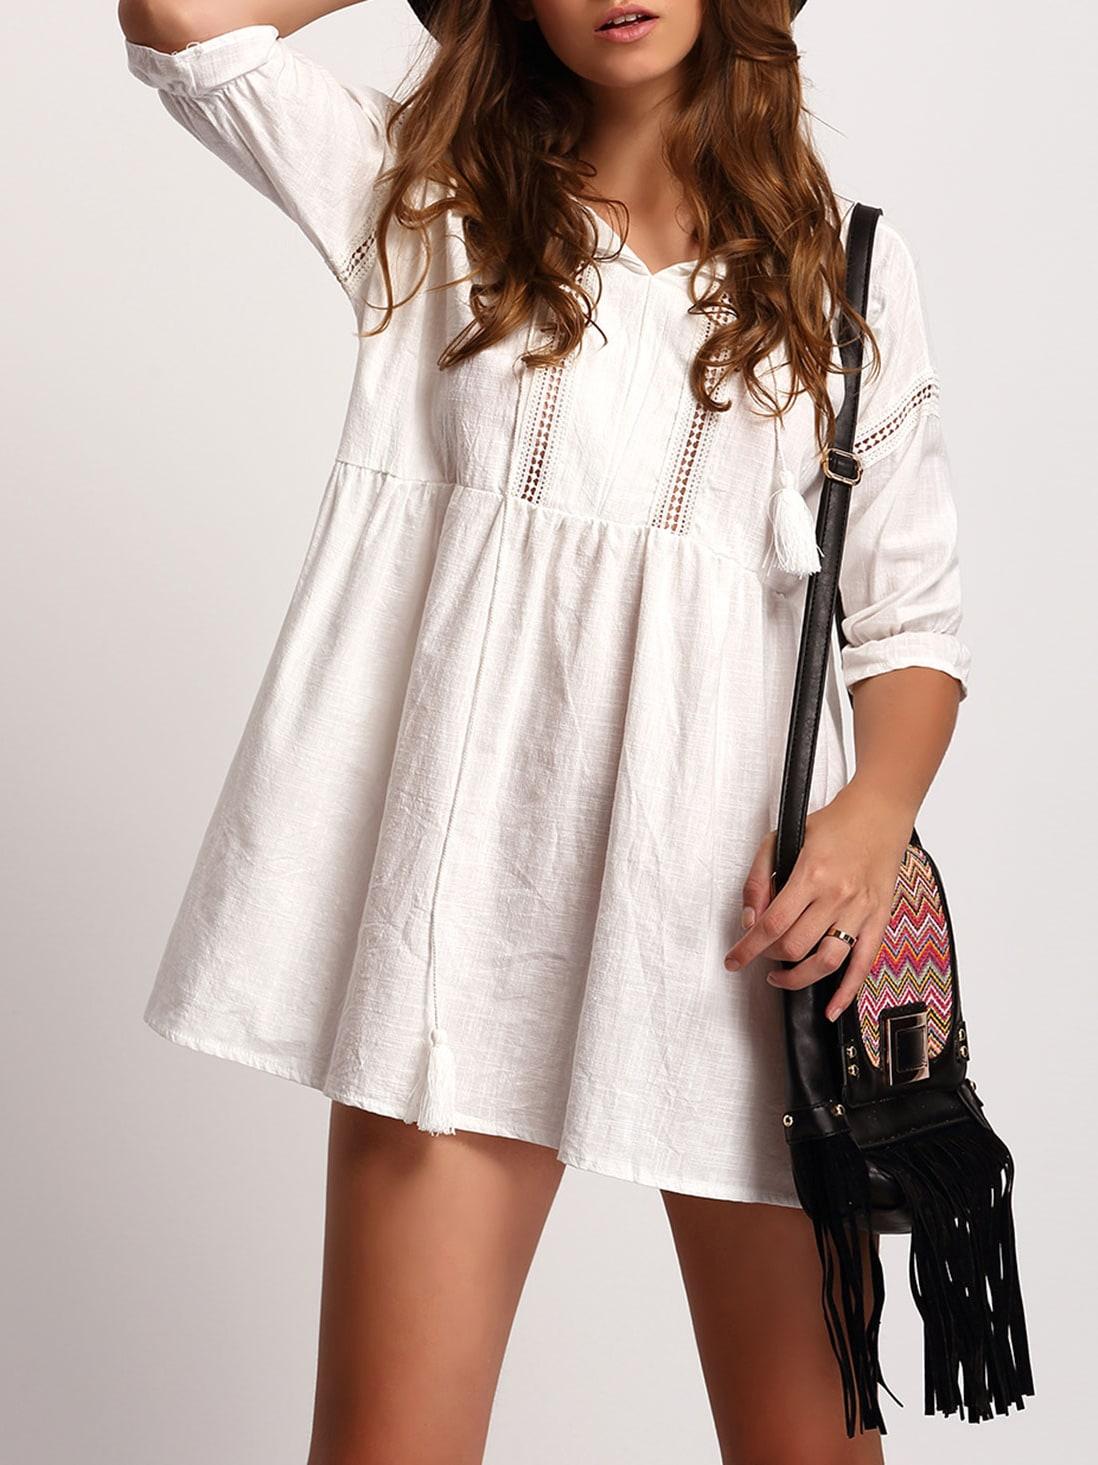 Vestido manga media suelto blanco spanish shein sheinside for Suelto blanco suelto barato